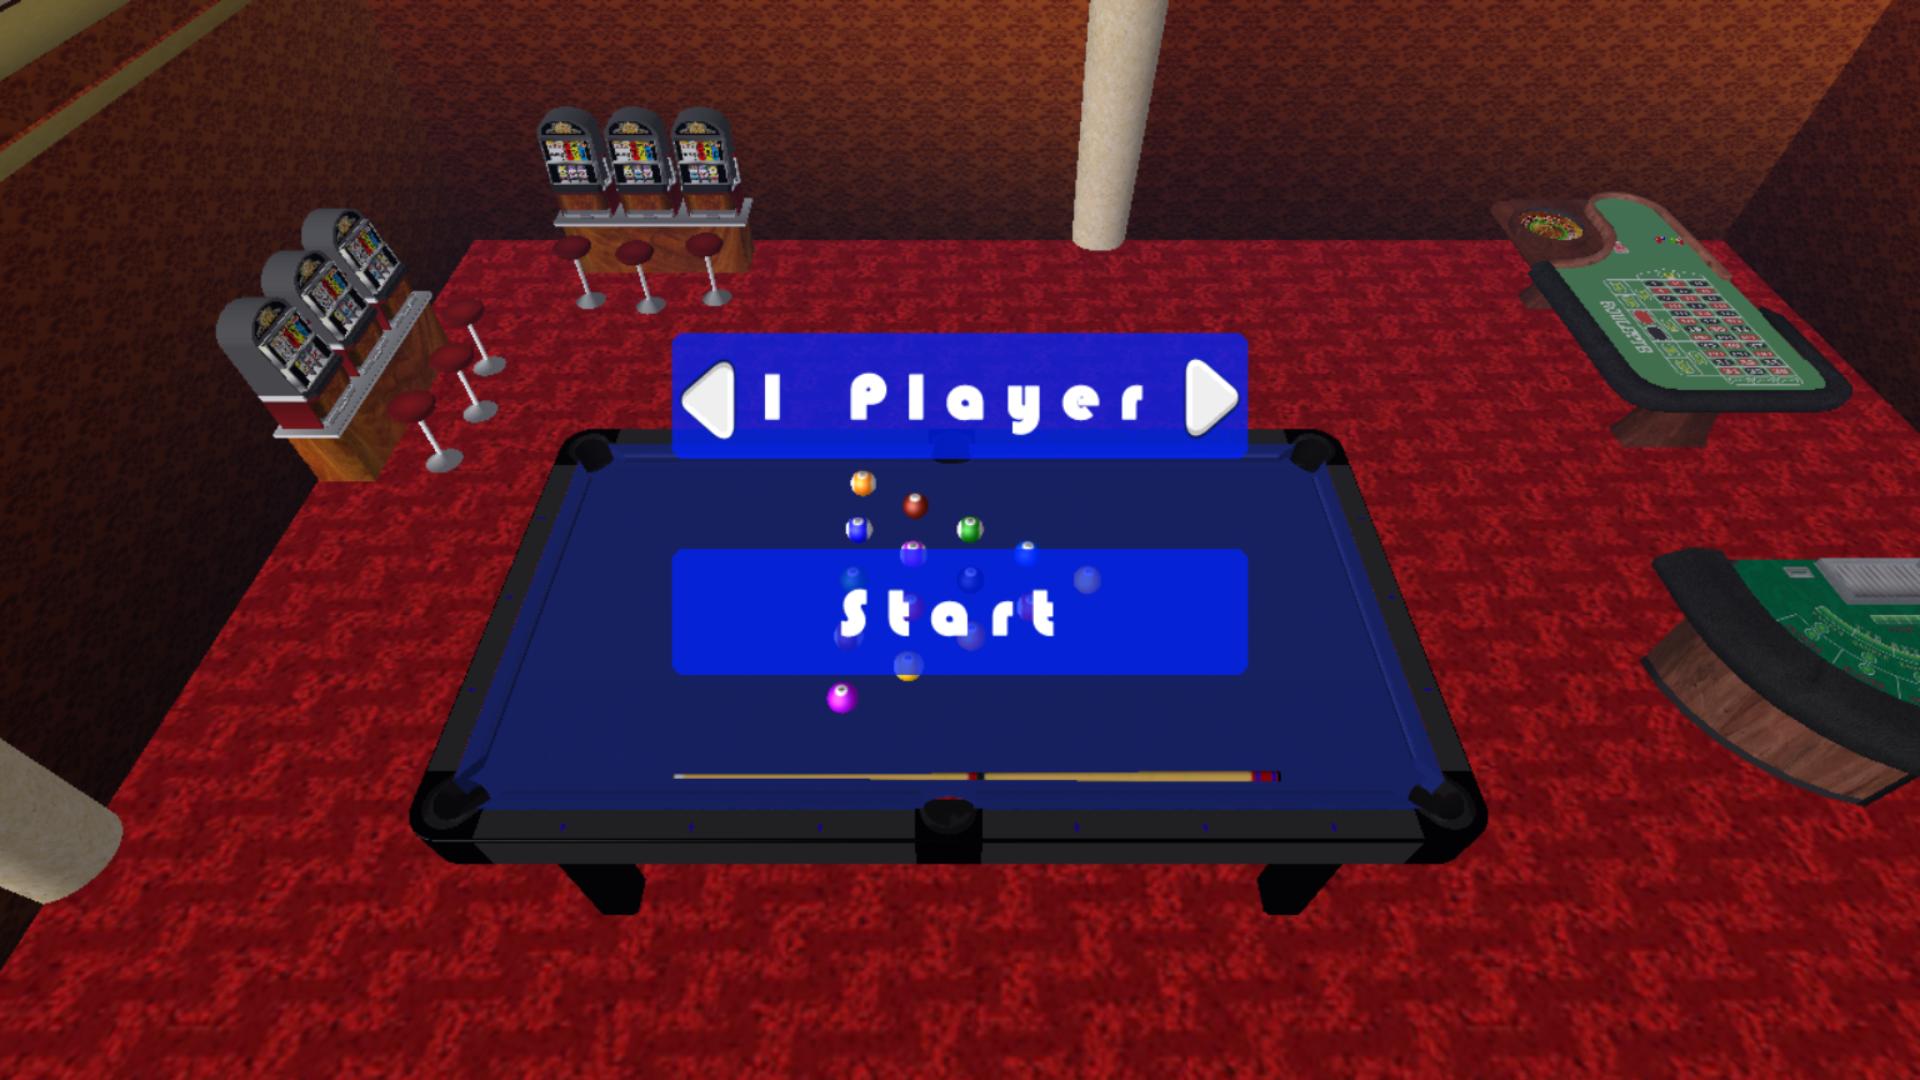 3D Pool Billiards Master Multiplayer Offline: Amazon.es: Appstore para Android